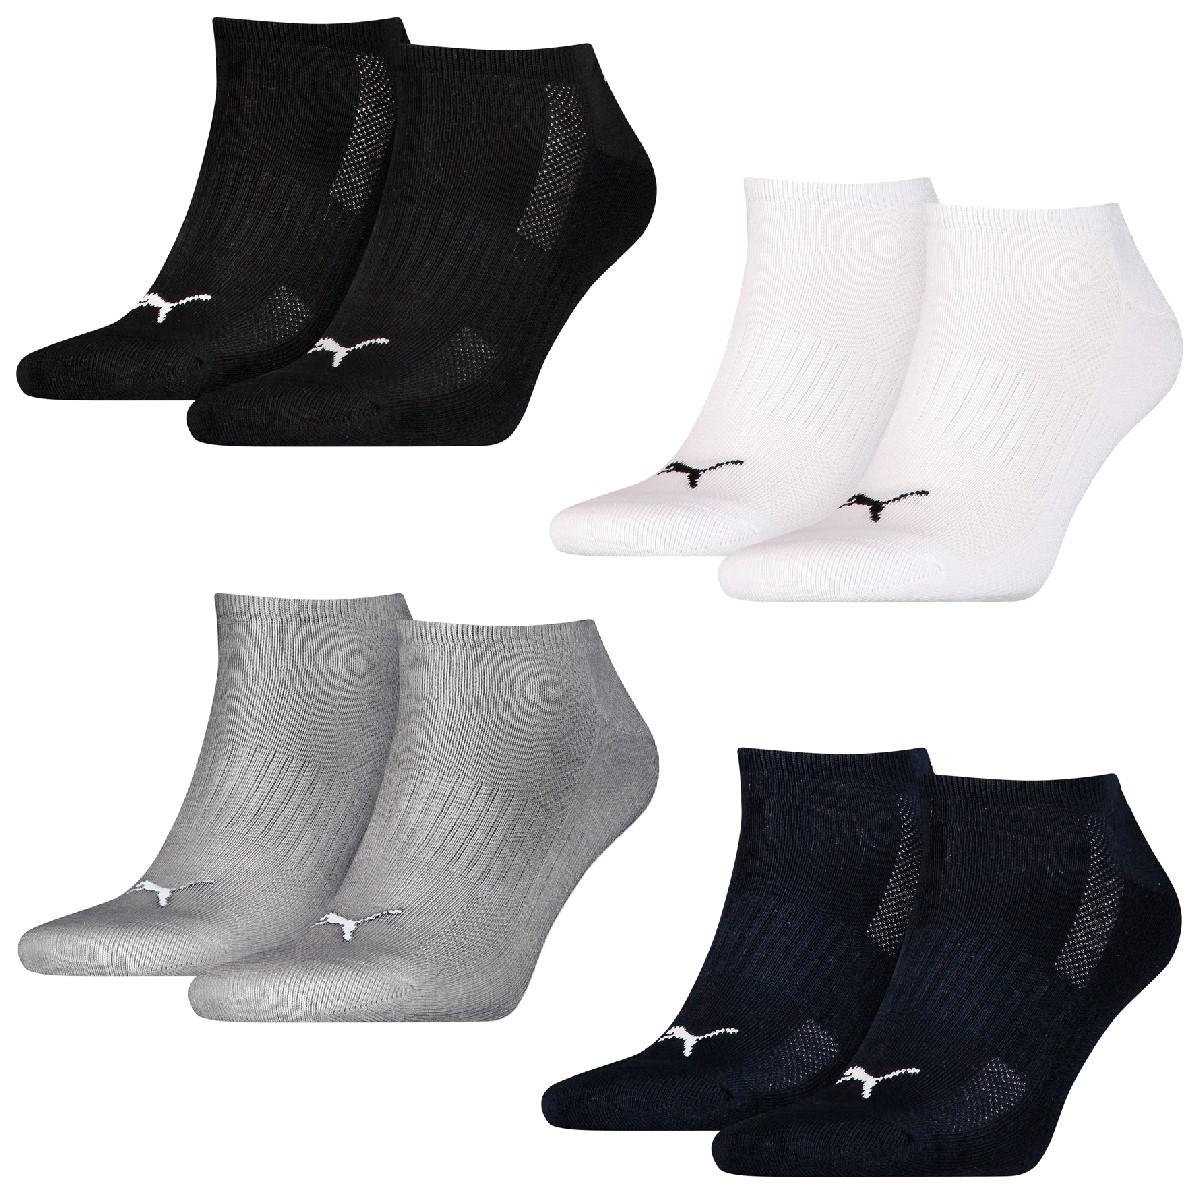 eaa3172bffc8 16 Paar Puma Sneaker Socken mit Frottee-Sohle Gr. 35 - 46 Unisex Cushioned